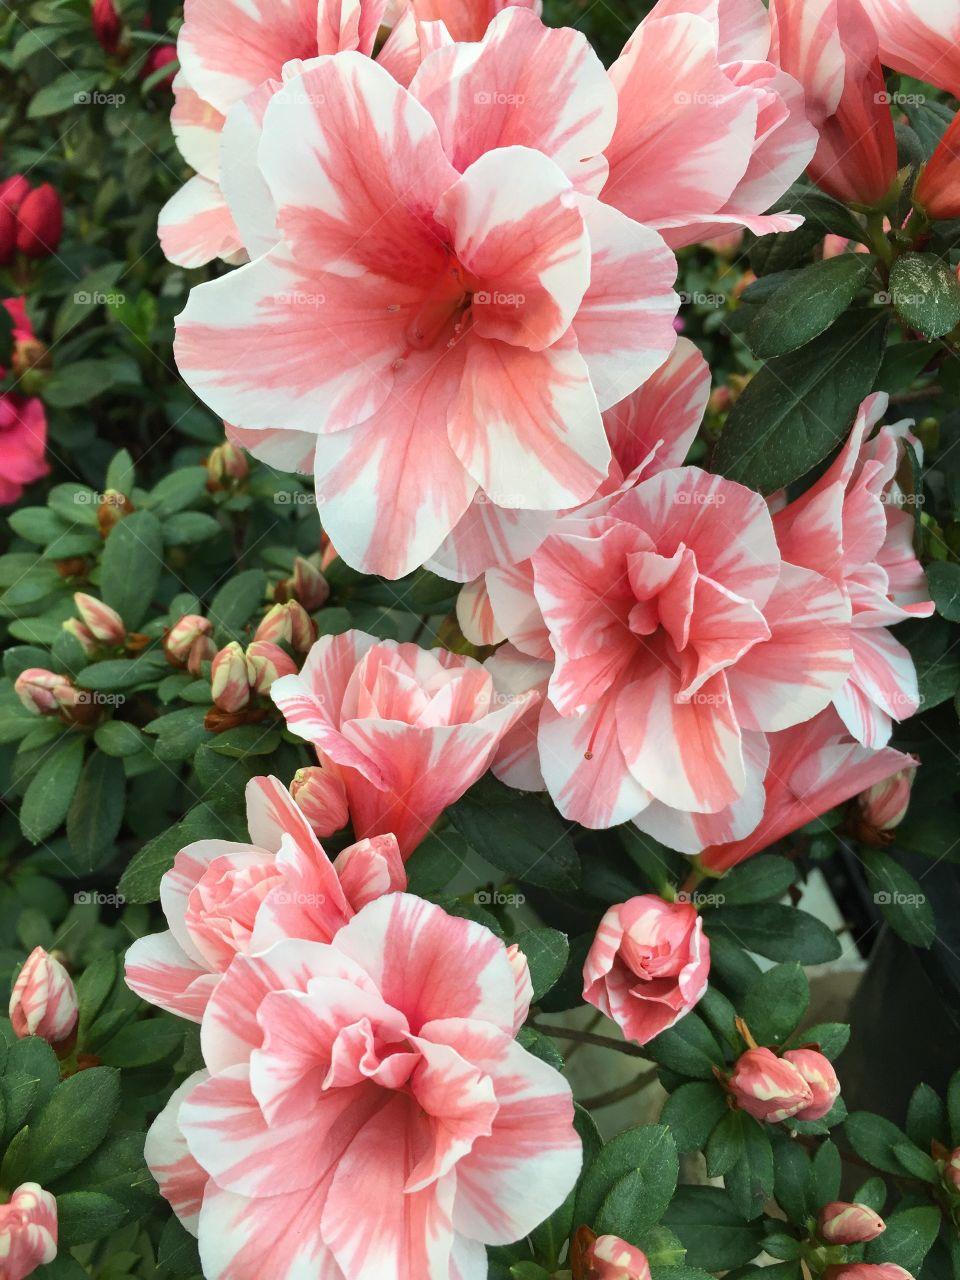 Beautiful bushed flower from the bush south korea.